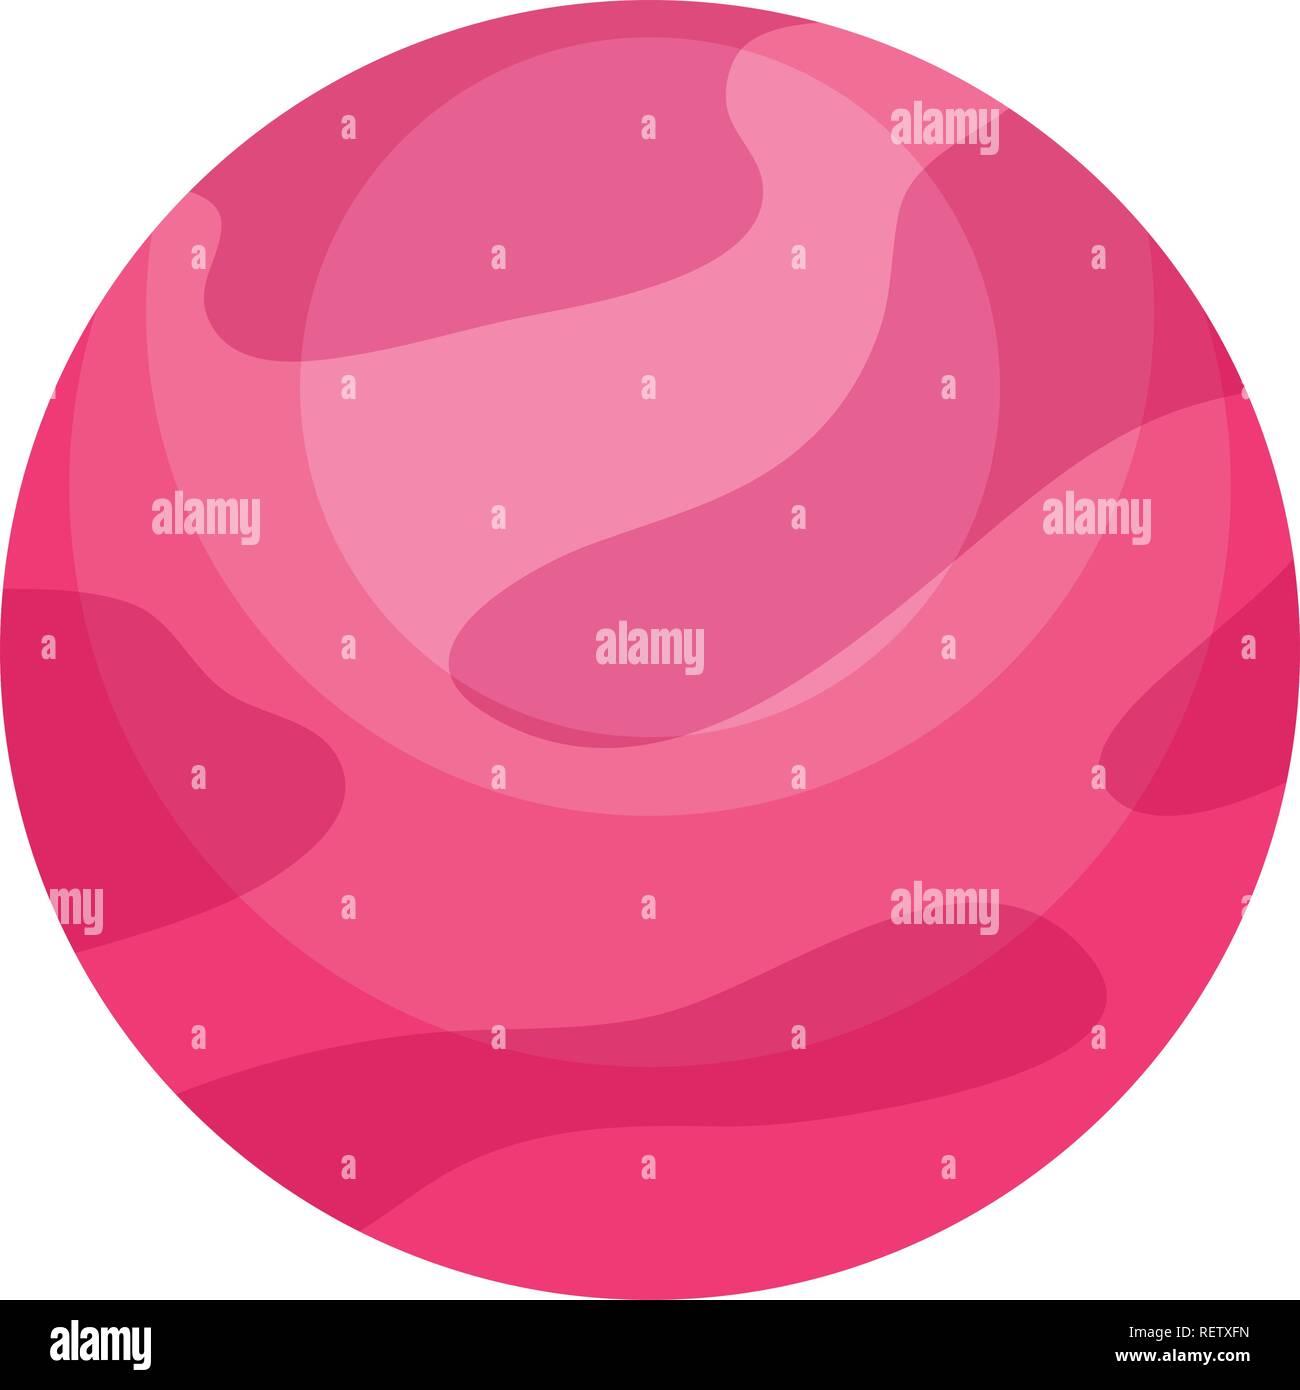 jupiter planet over white background, vector illustration - Stock Image